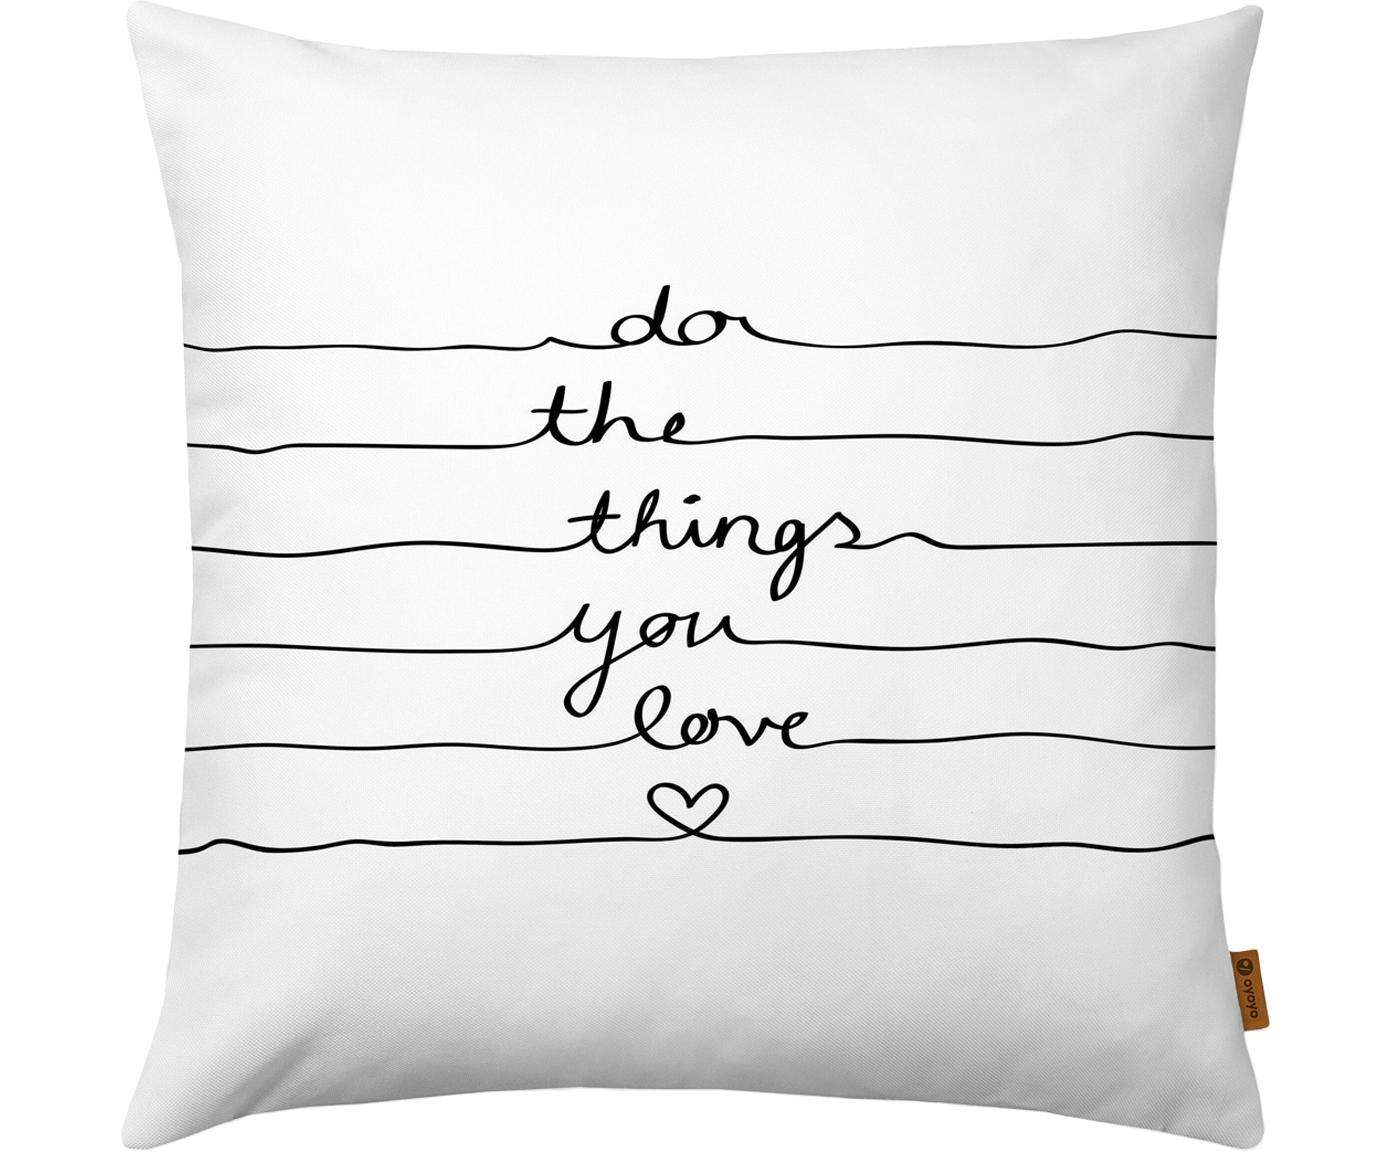 Kissenhülle Do The Things You Love mit Schriftzug, 100% Polyester, Weiß, Schwarz, 40 x 40 cm